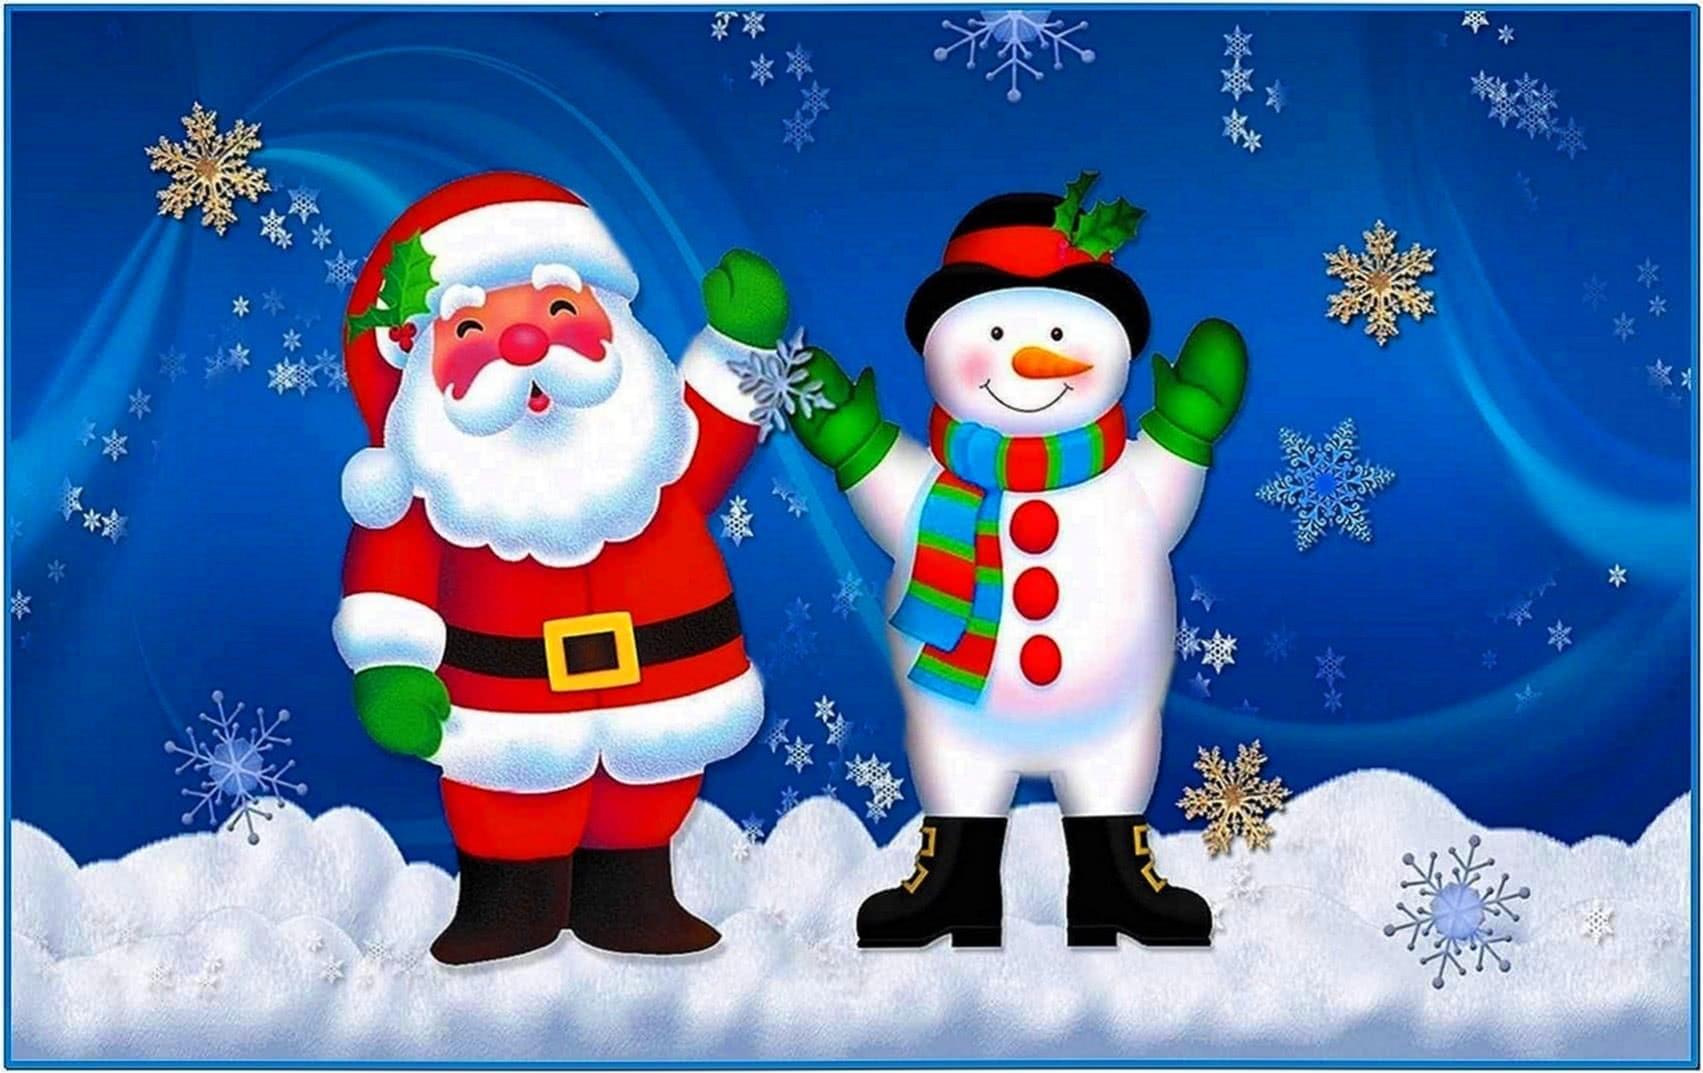 Christmas Wallpapers and Screensavers for Mobile